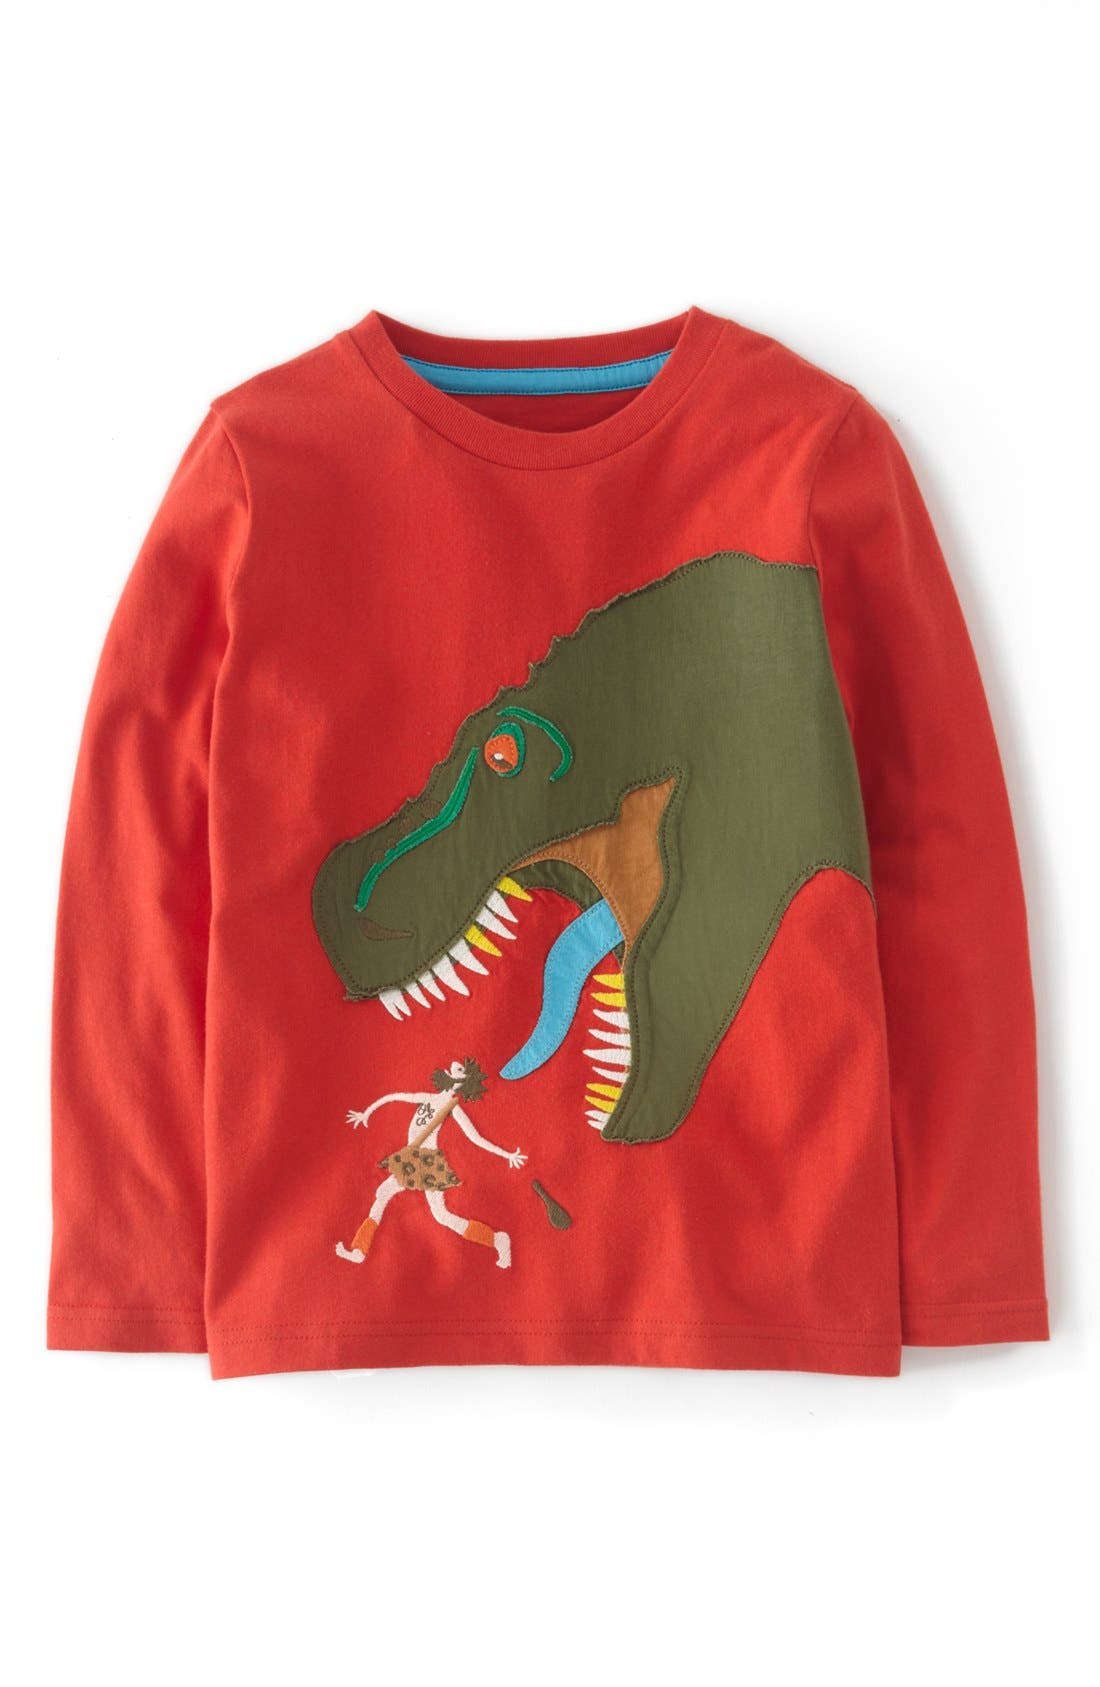 Alternate Image 1 Selected - Mini Boden 'Action' Long Sleeve T-Shirt (Little Boys & Big Boys)